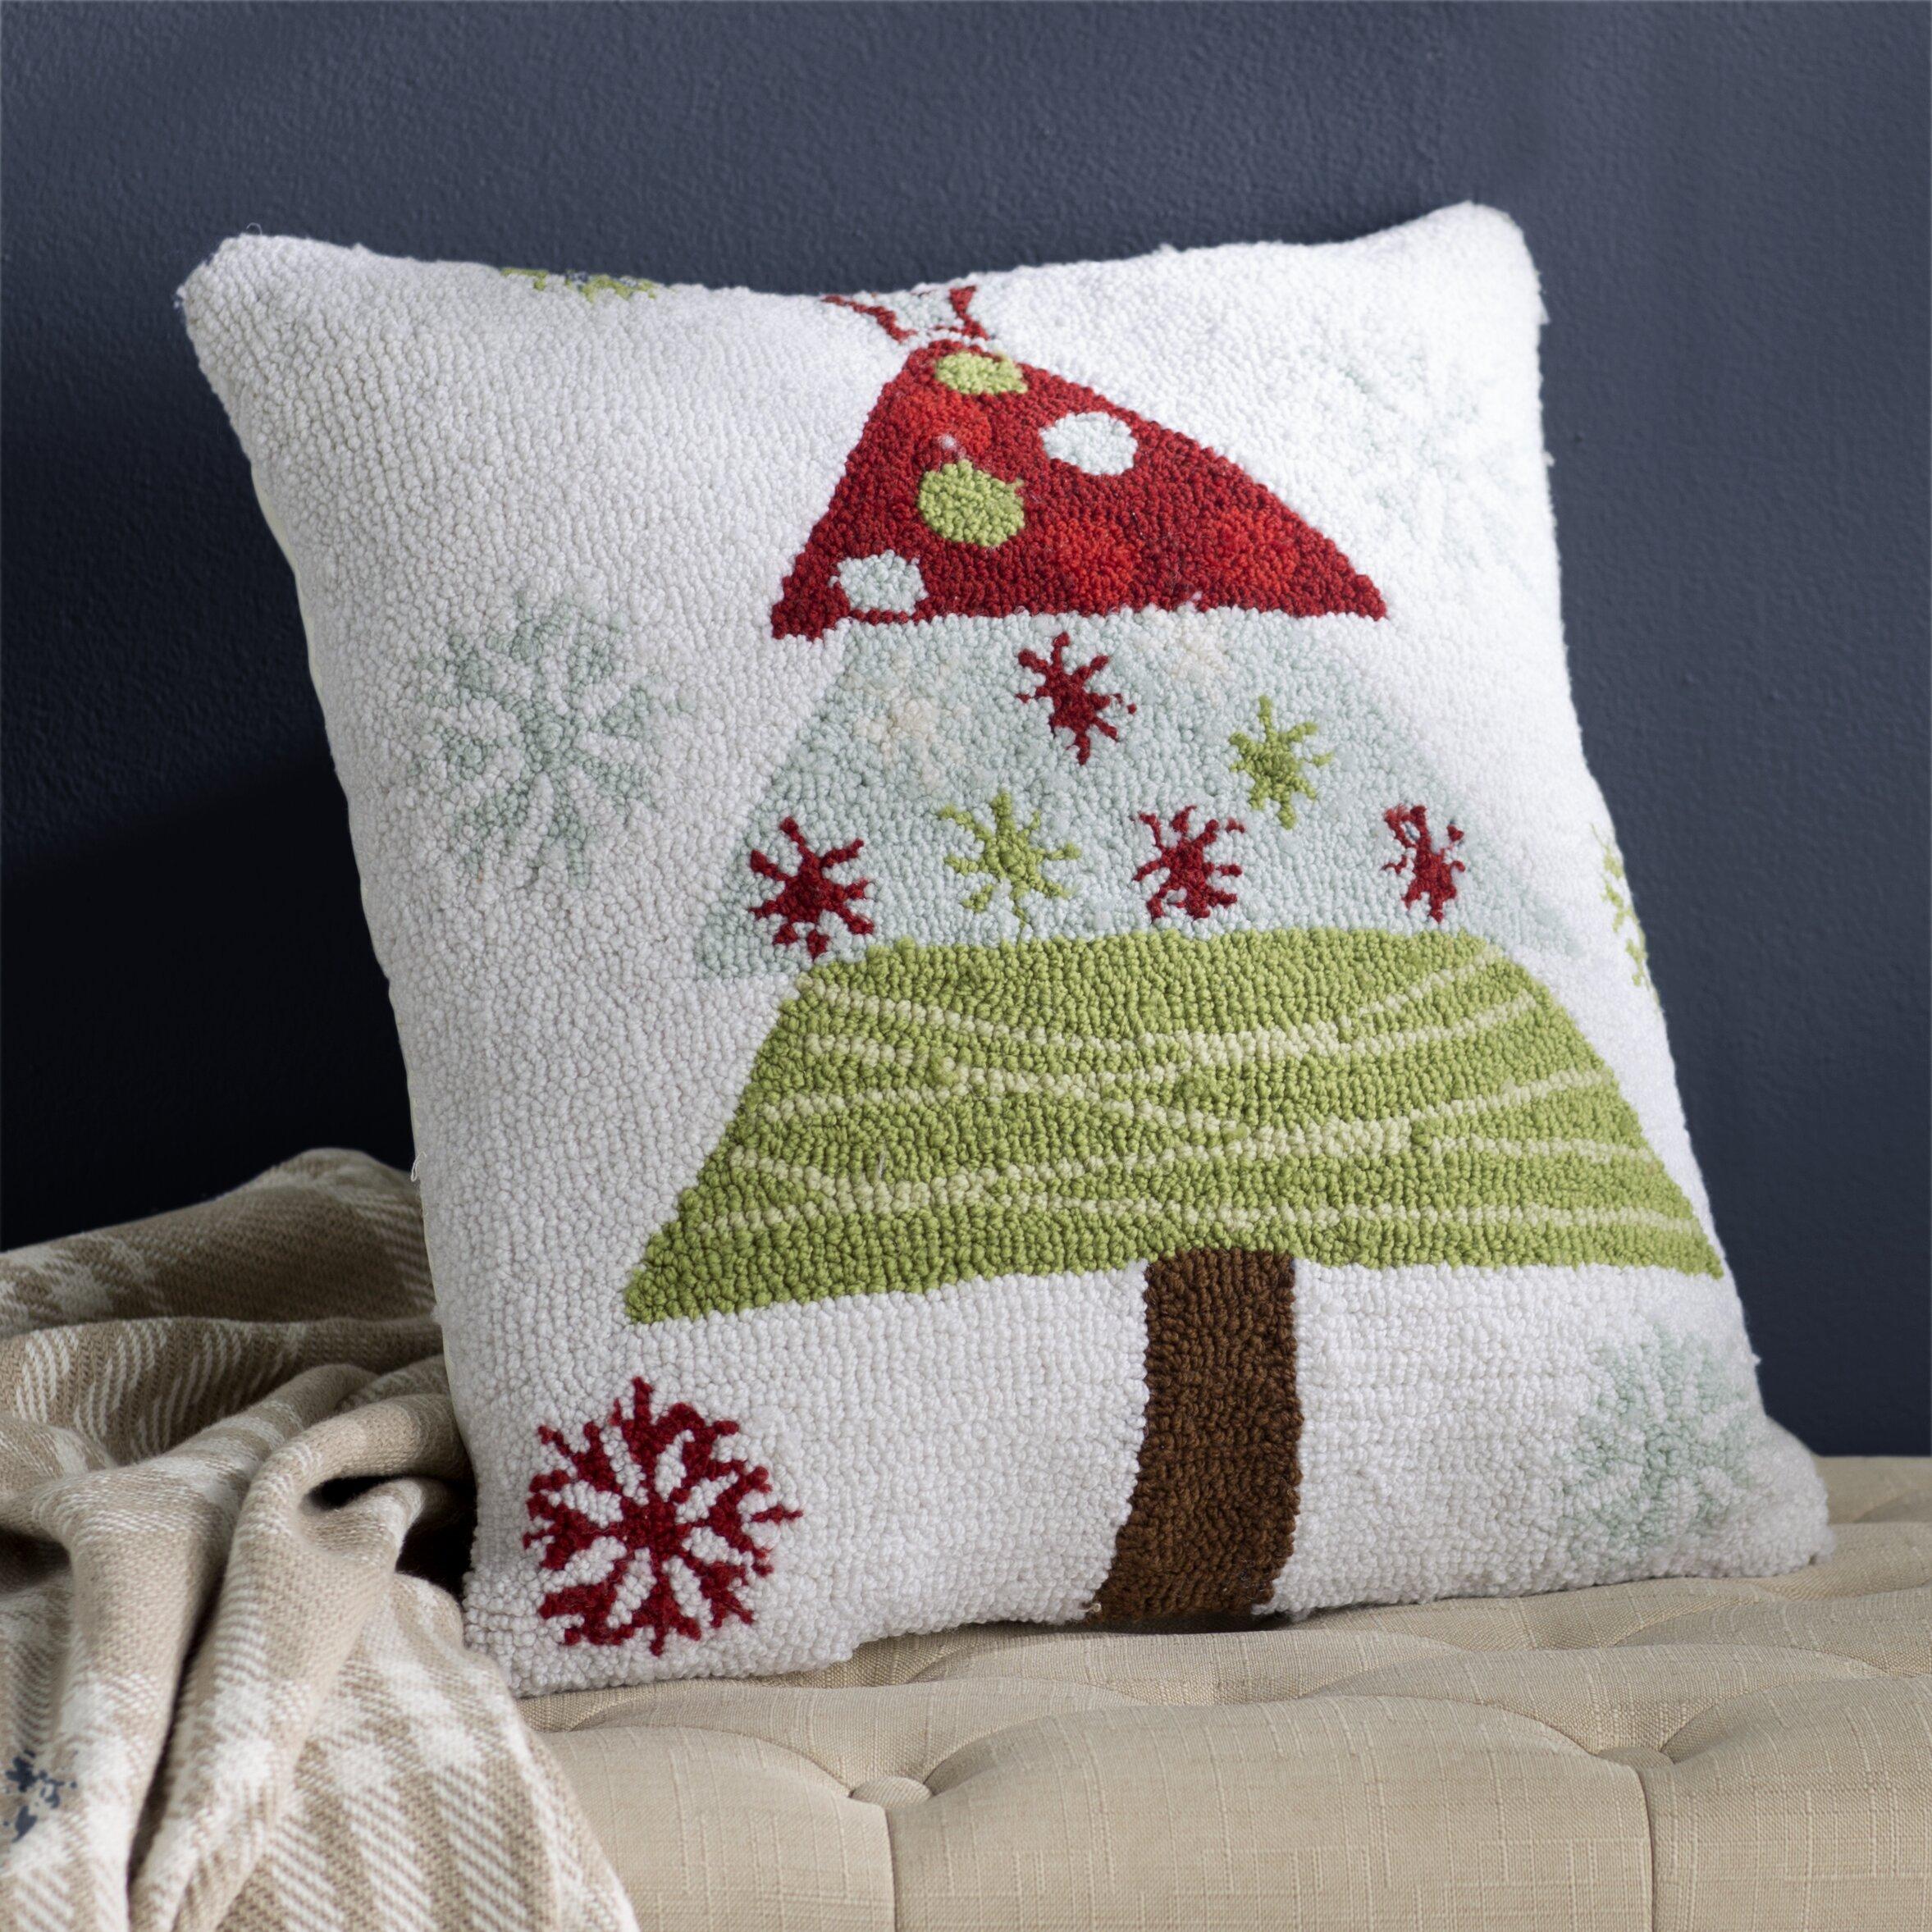 Three Posts Malta Christmas Tree Polyester Throw Pillow